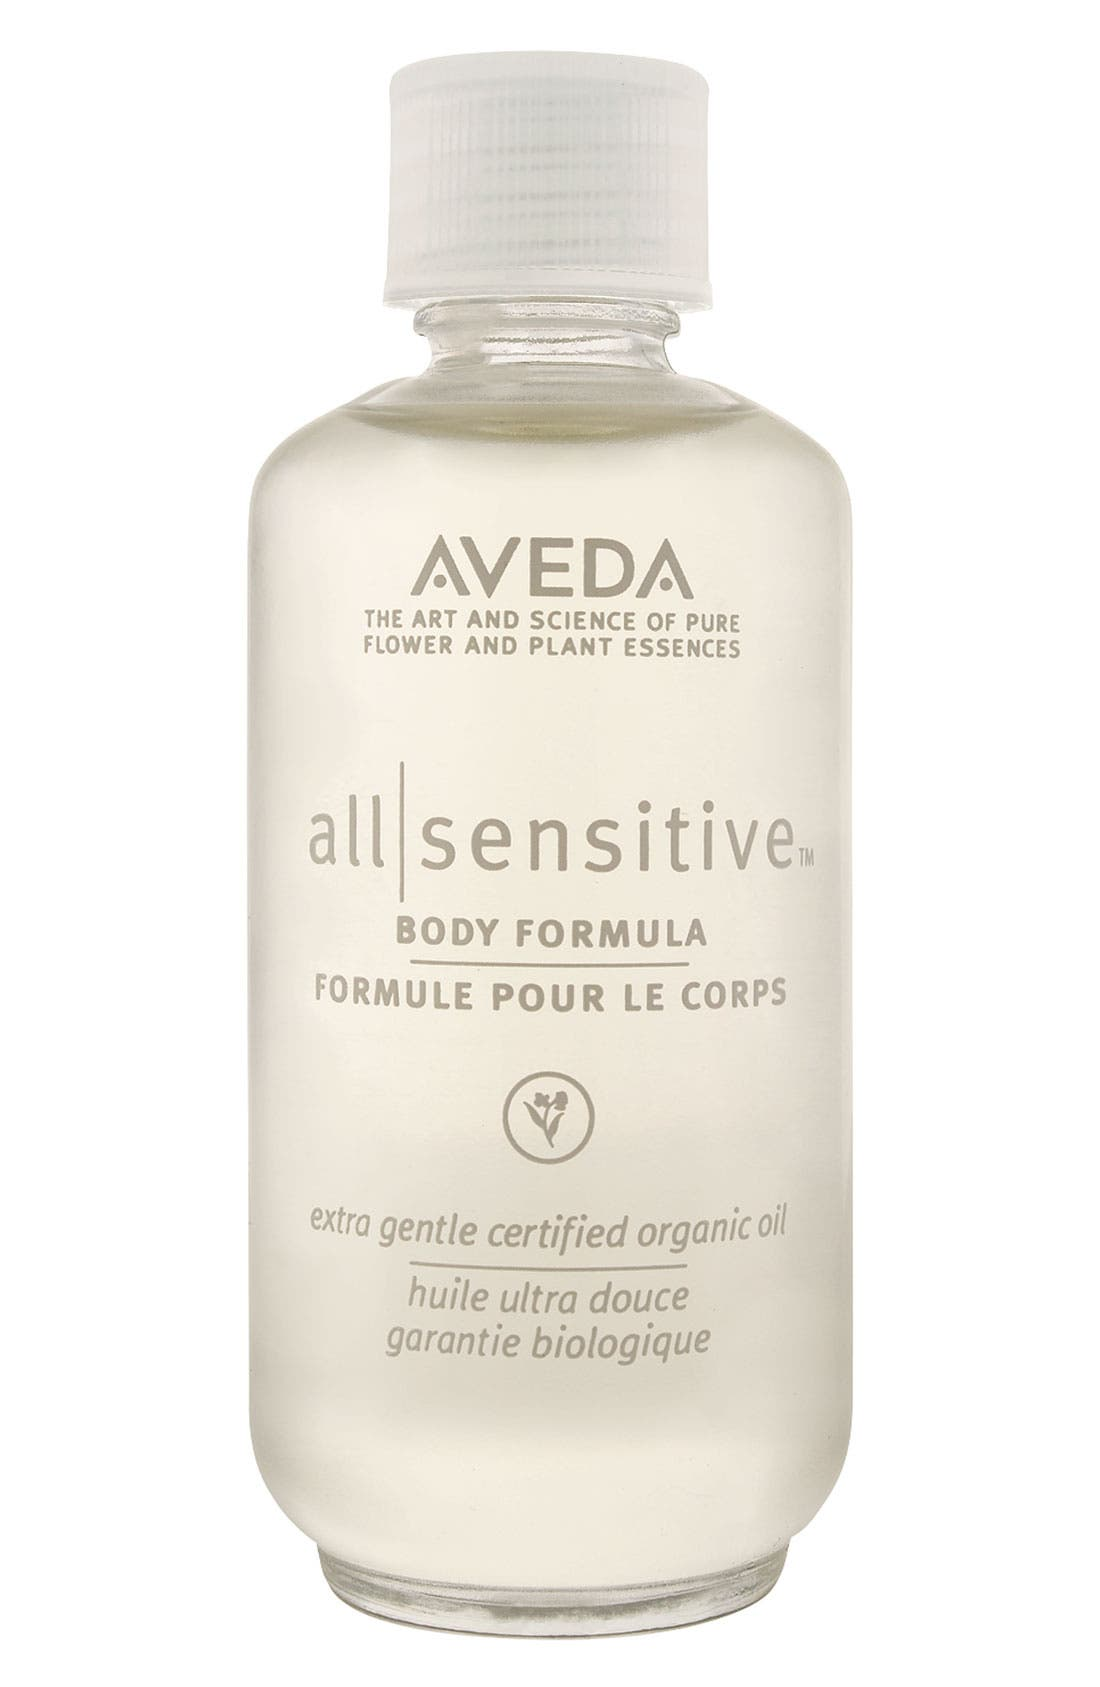 Aveda 'all-sensitive™' Body Formula